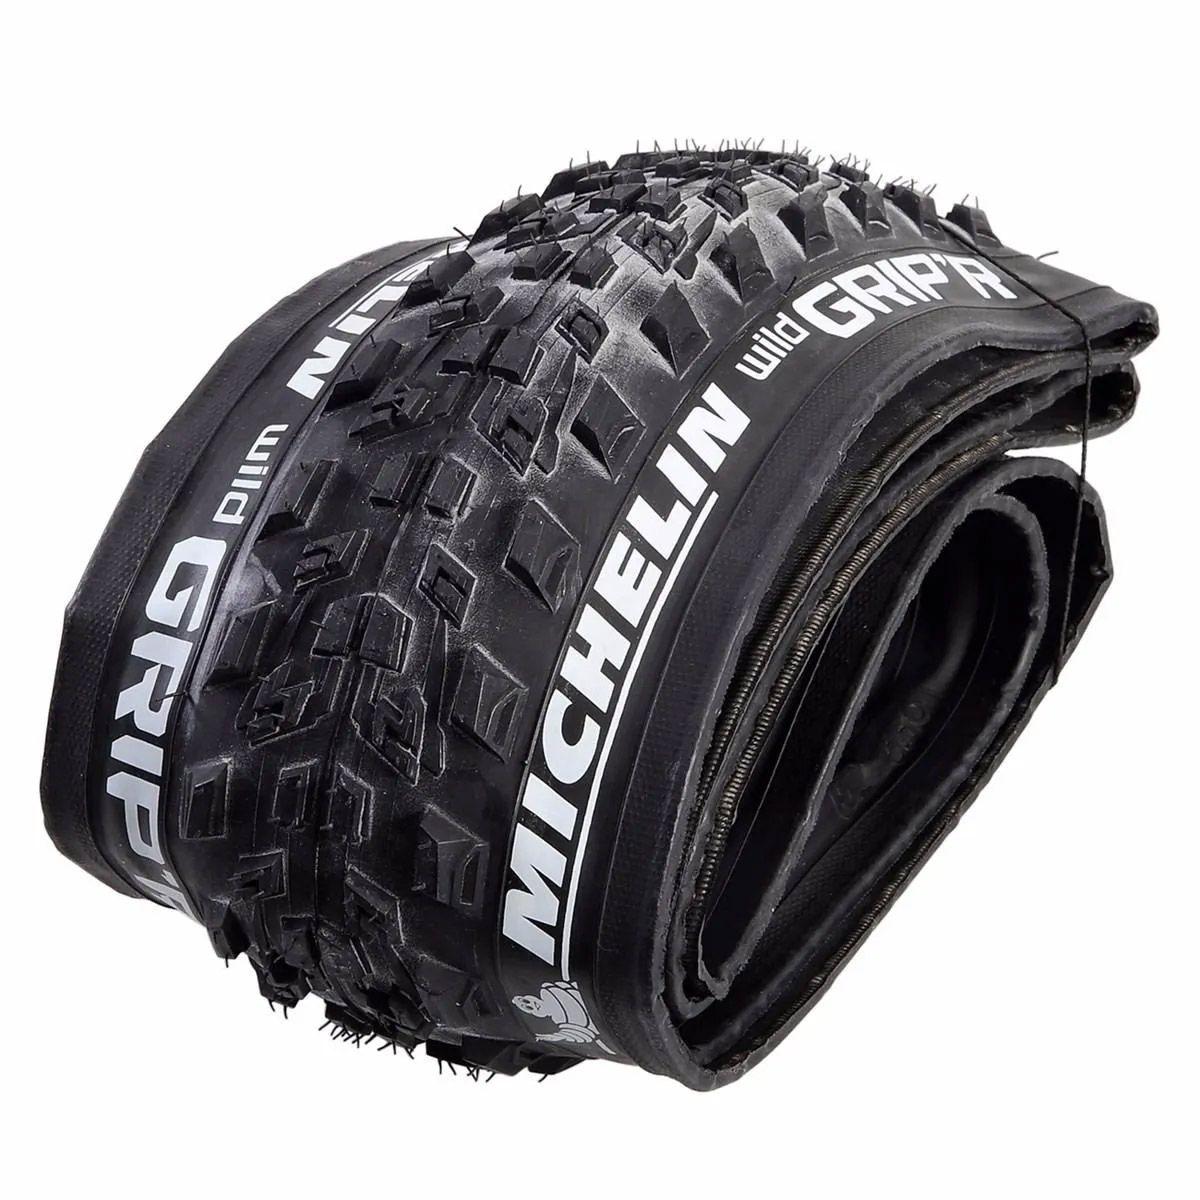 Pneu Bicicleta Mtb Michelin Wild Grip'r 29 x 2.10 Tubeless Ready Dobrável em Kevlar